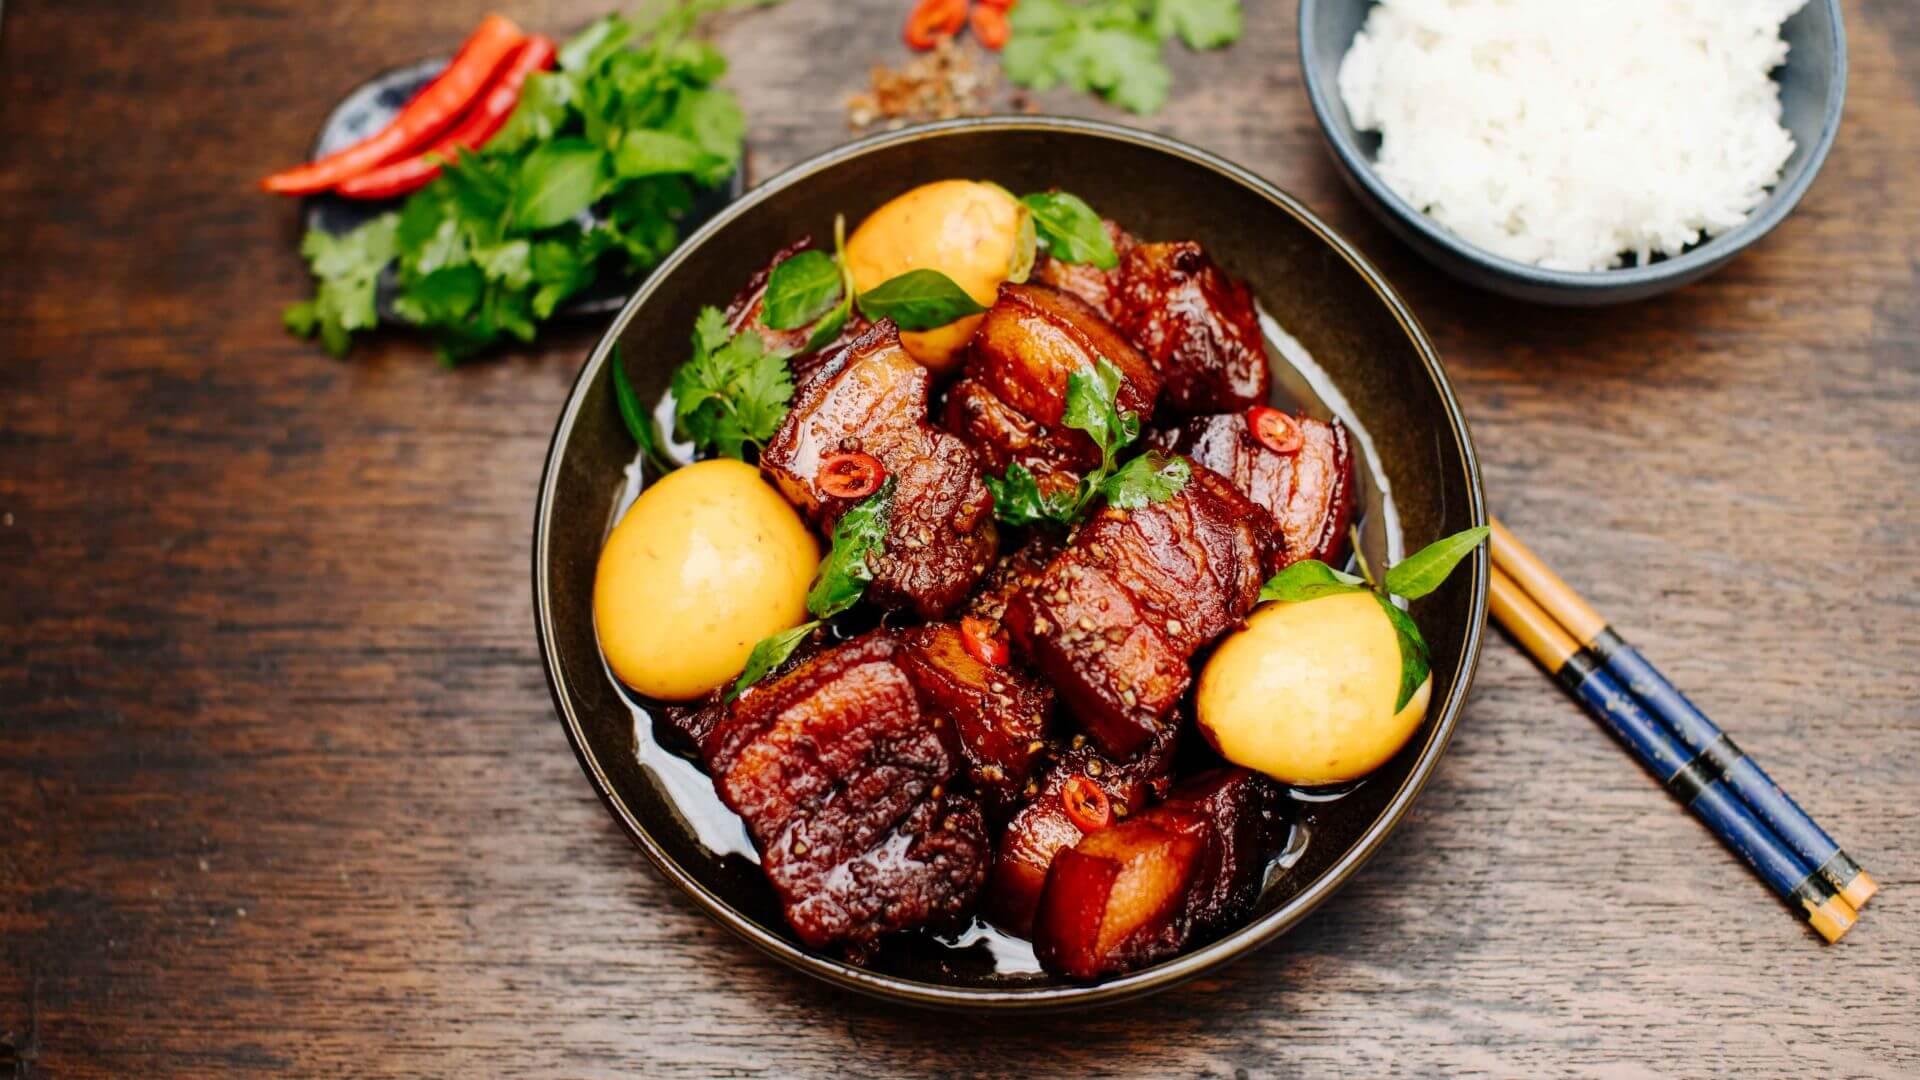 Geschmortes Schwein in Karamell - Thit Kho Tau